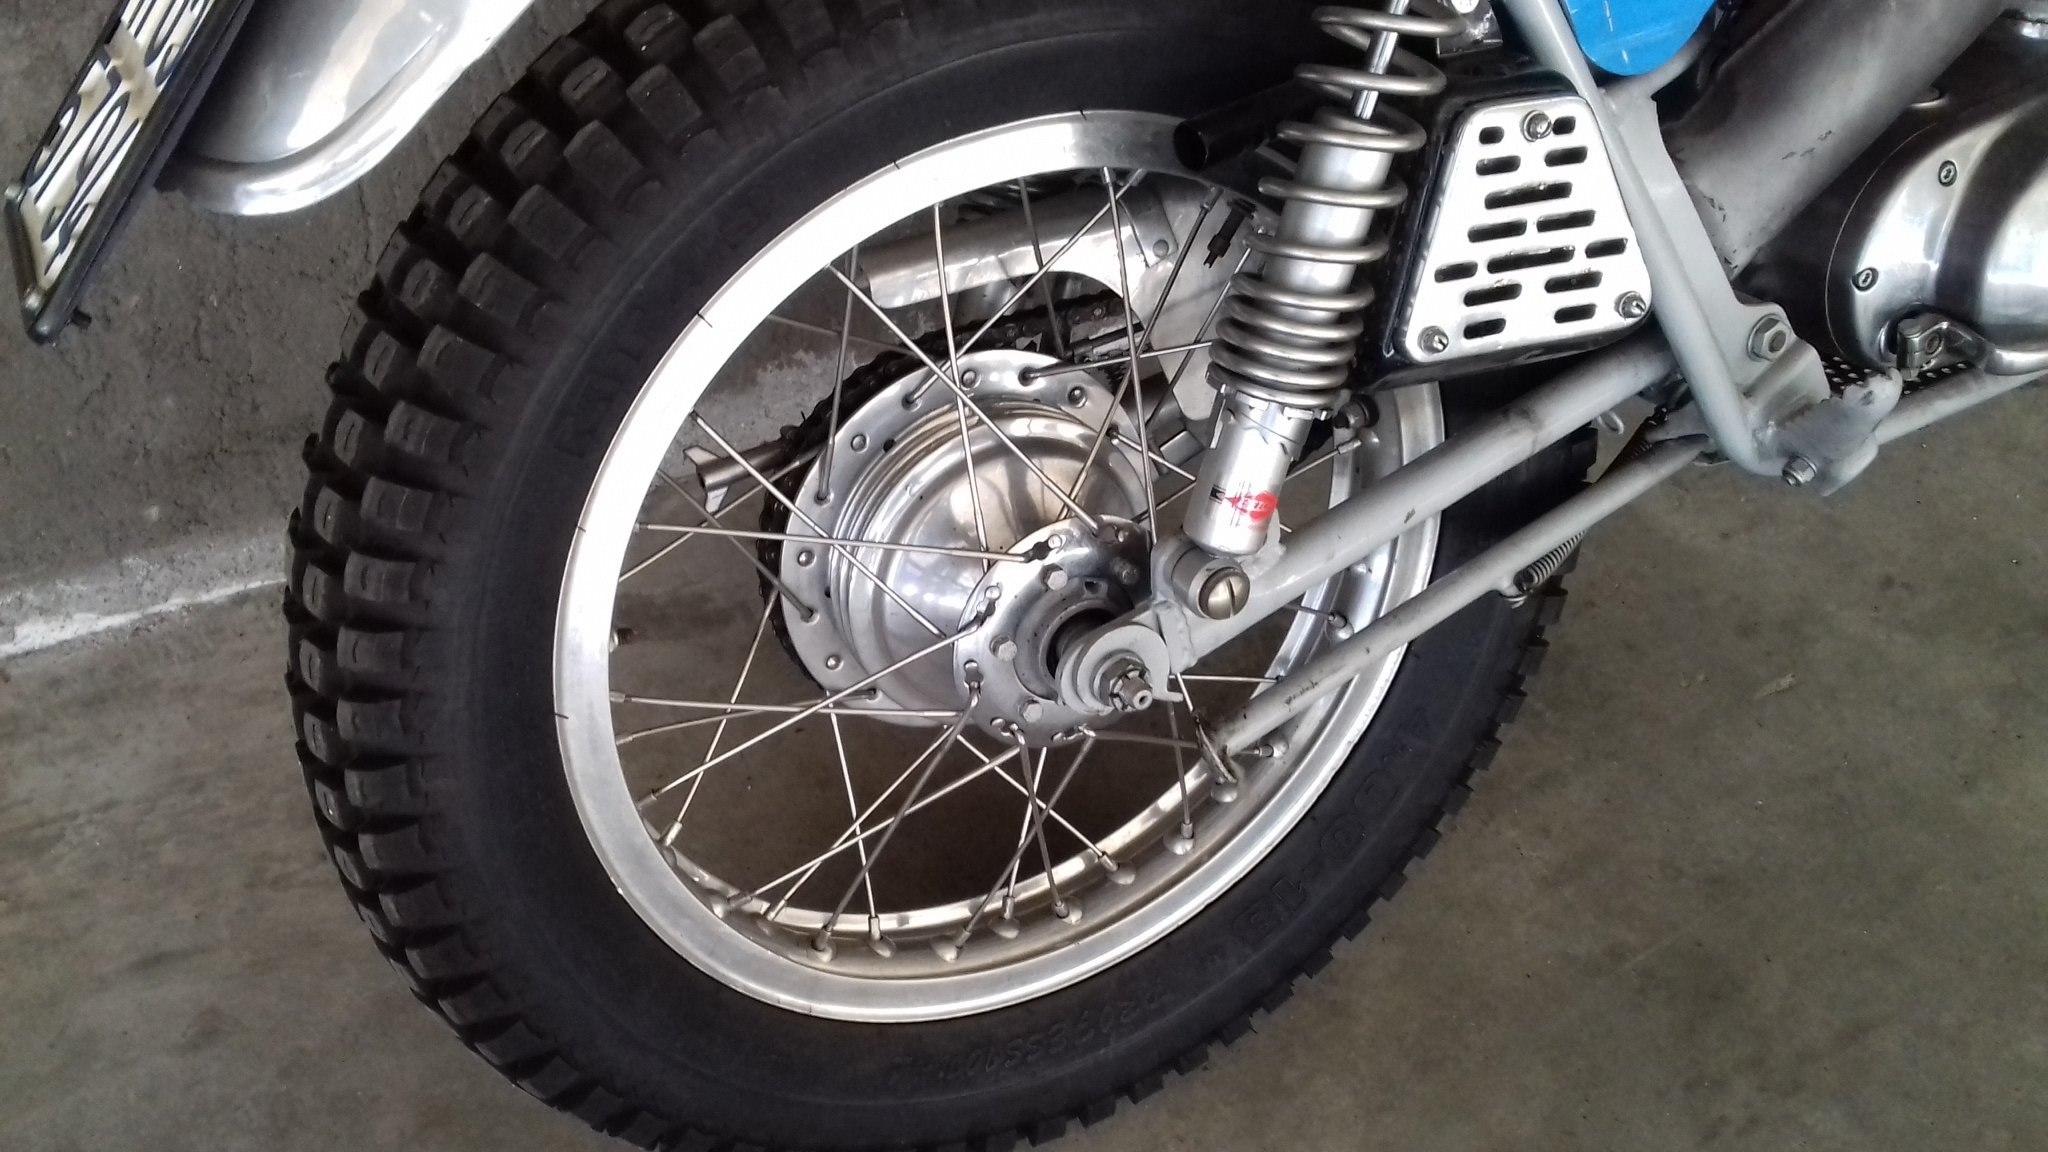 1973 Bultaco Alpina 250 For Sale (picture 4 of 6)